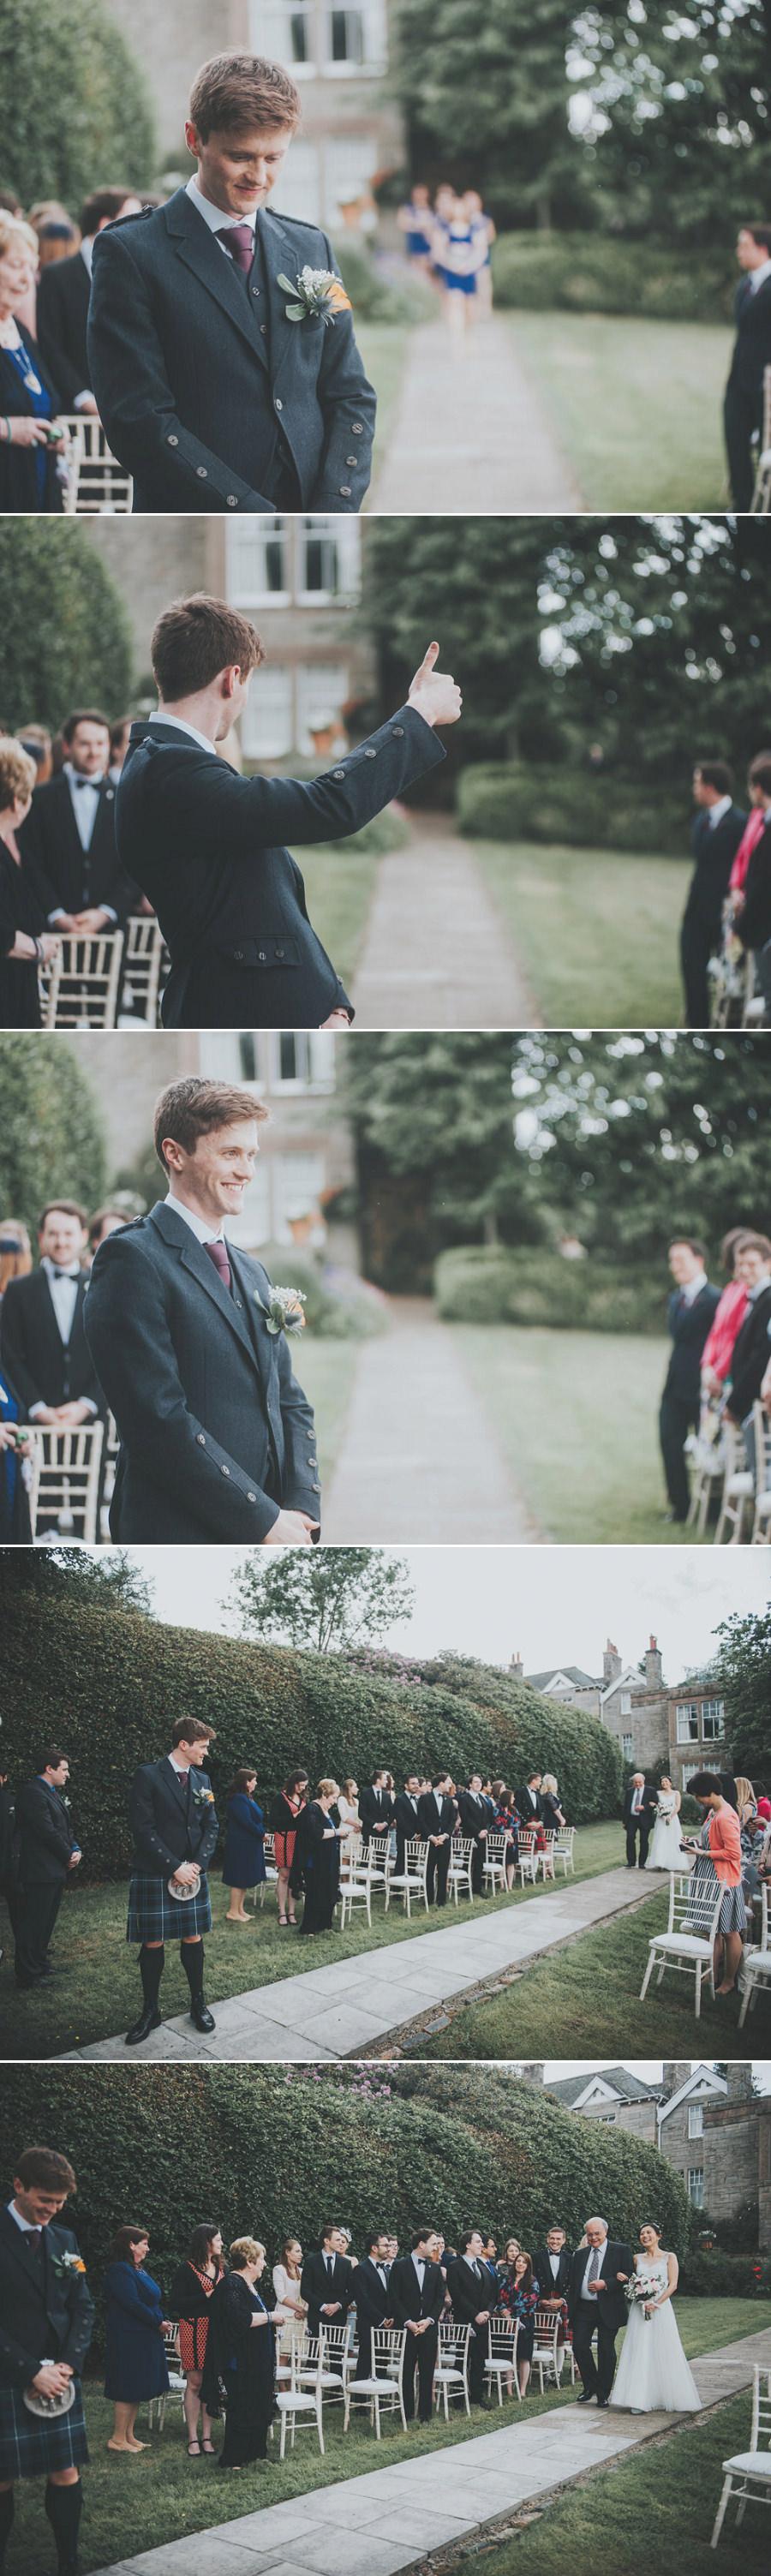 scottish-wedding-photography-vintage-photographer-018.jpg